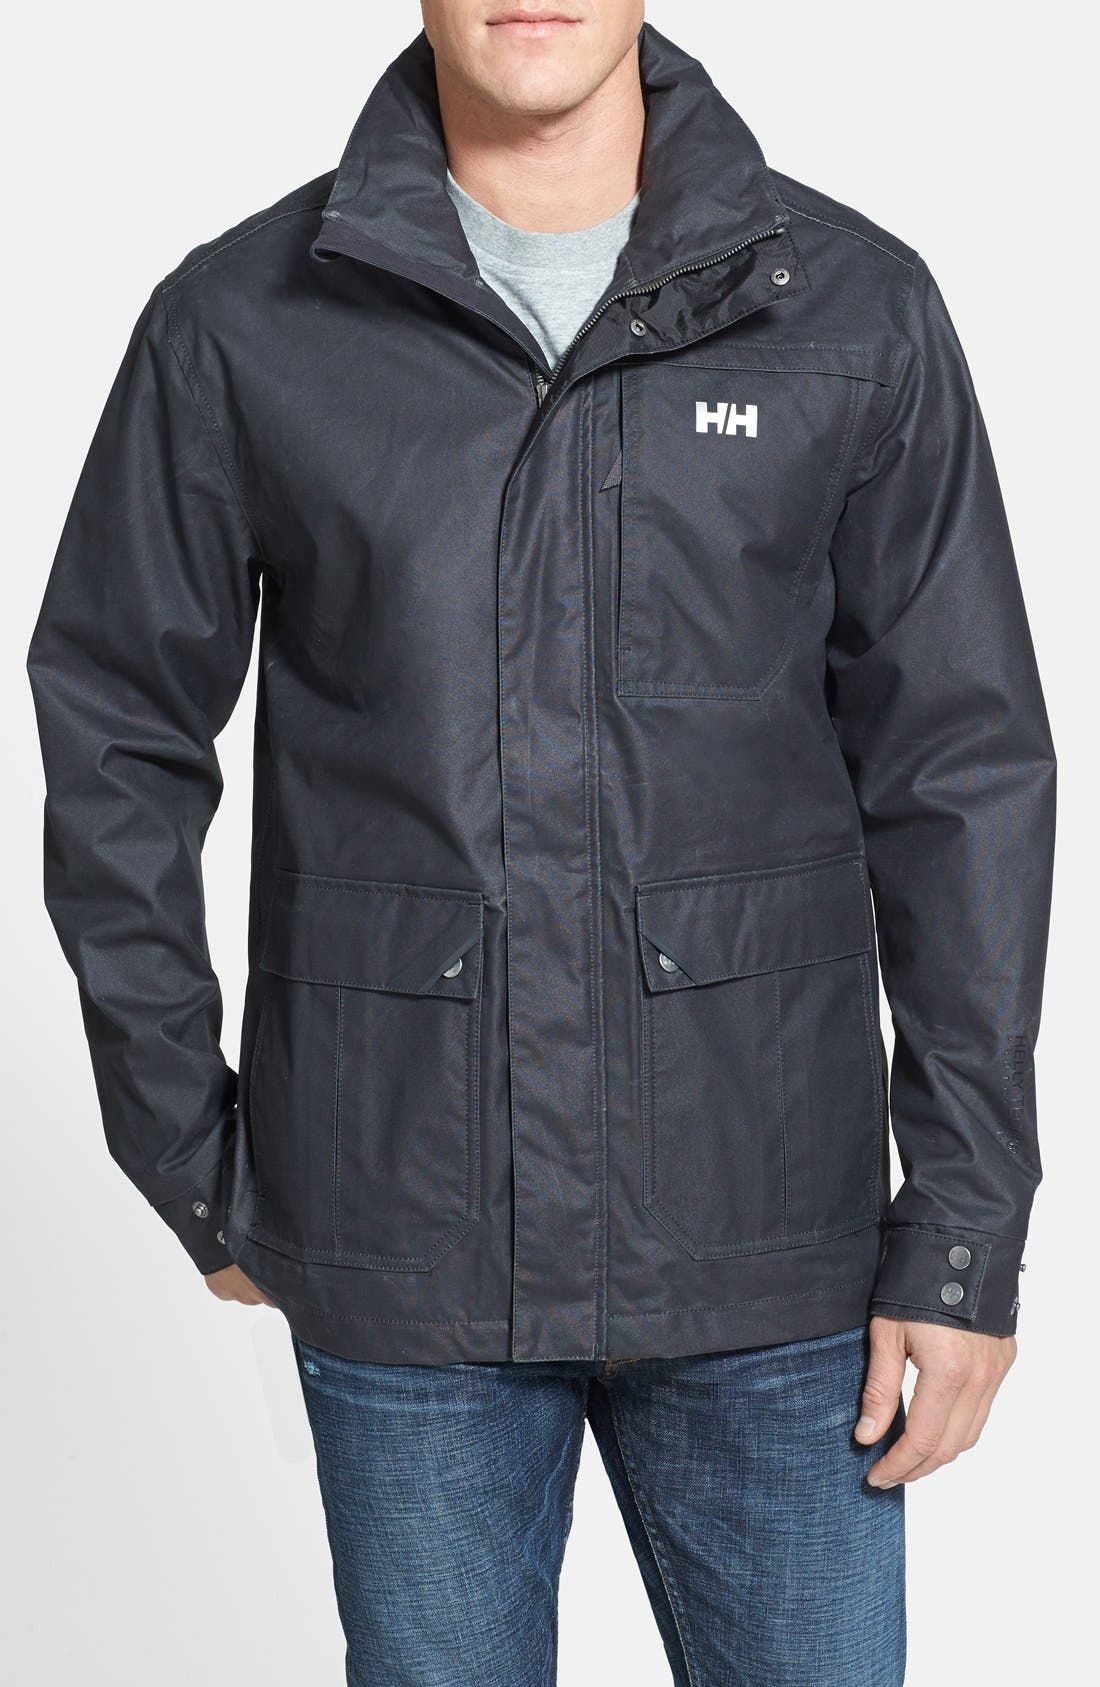 Main Image - Helly Hansen 'Robson' Waxed Surface Waterproof & Windproof Jacket